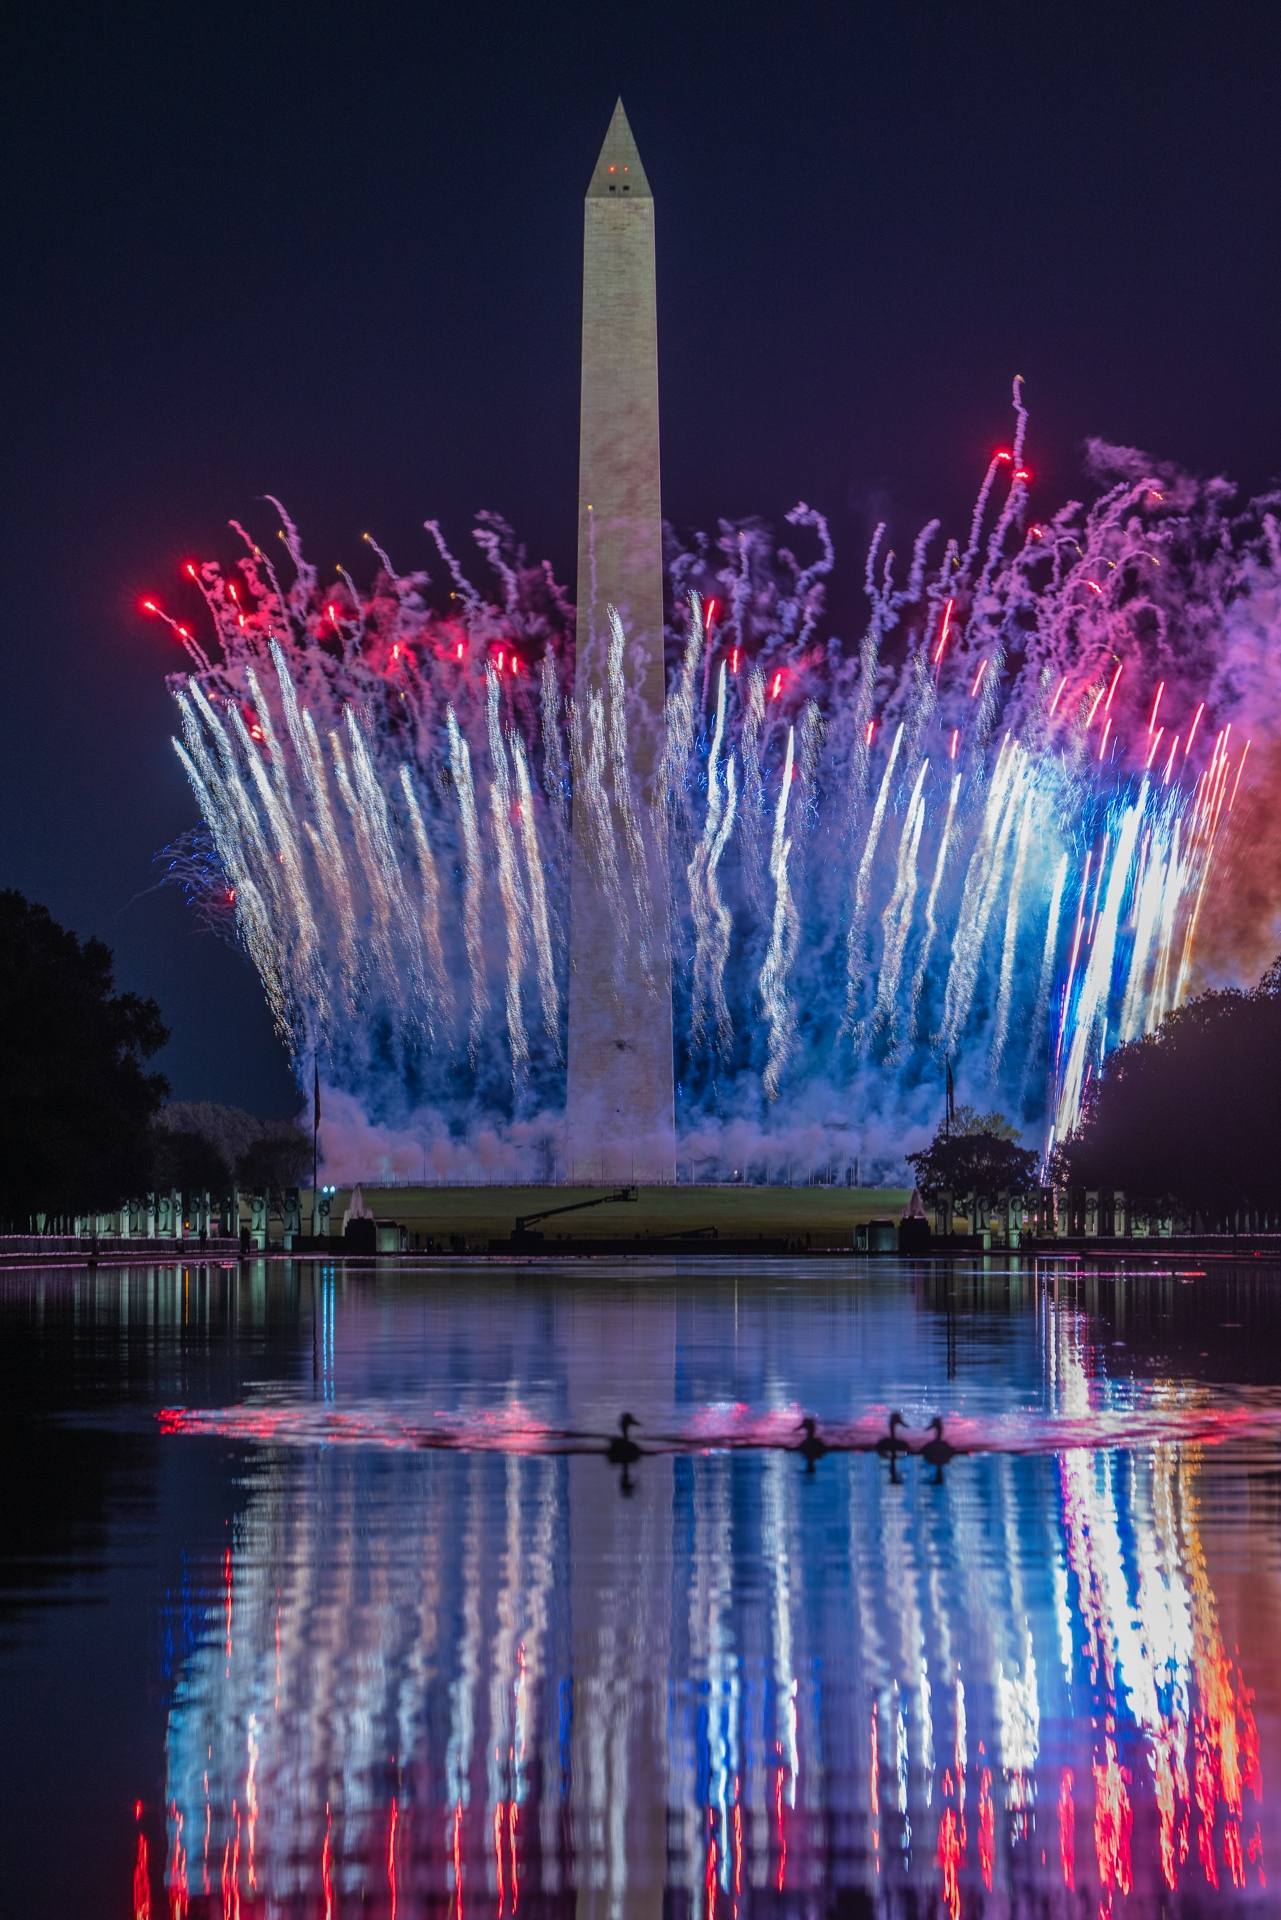 white house, washington monument, fireworks, reflecting pool, reflections, firework display, washington dc, president trump, republican nomination